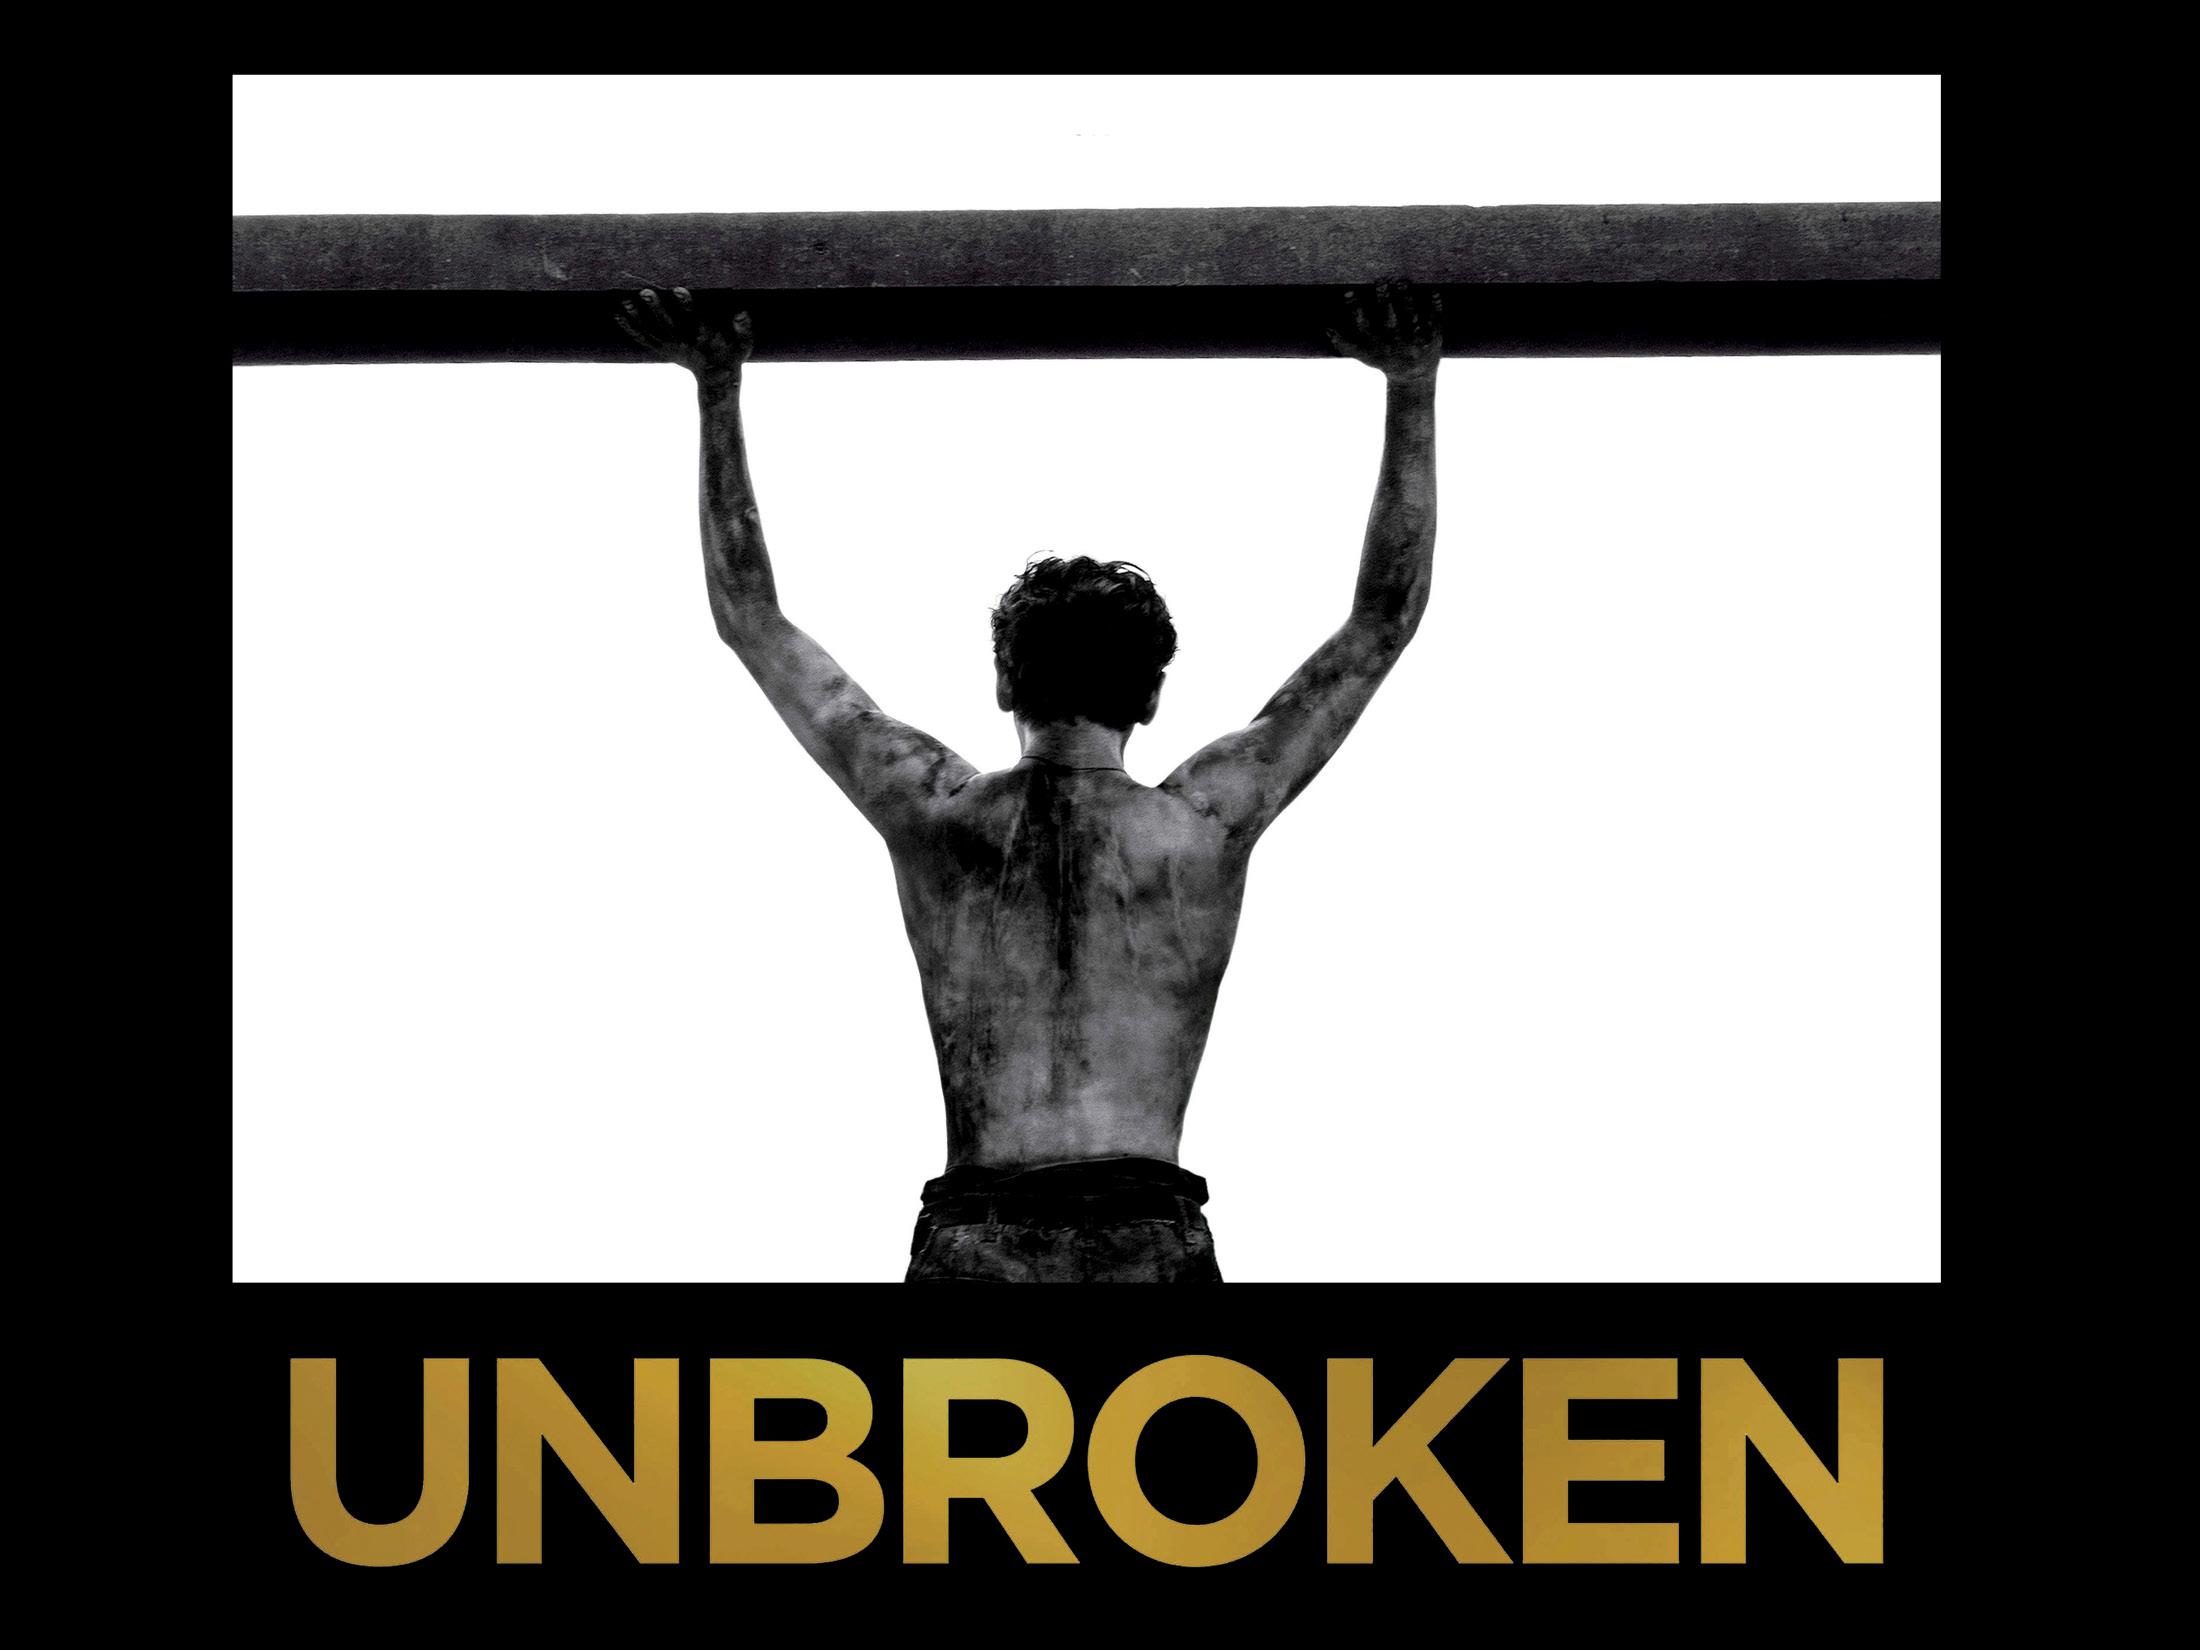 Jon-Hutman-feature-film-set-design-unbroken-_Page_001.jpg